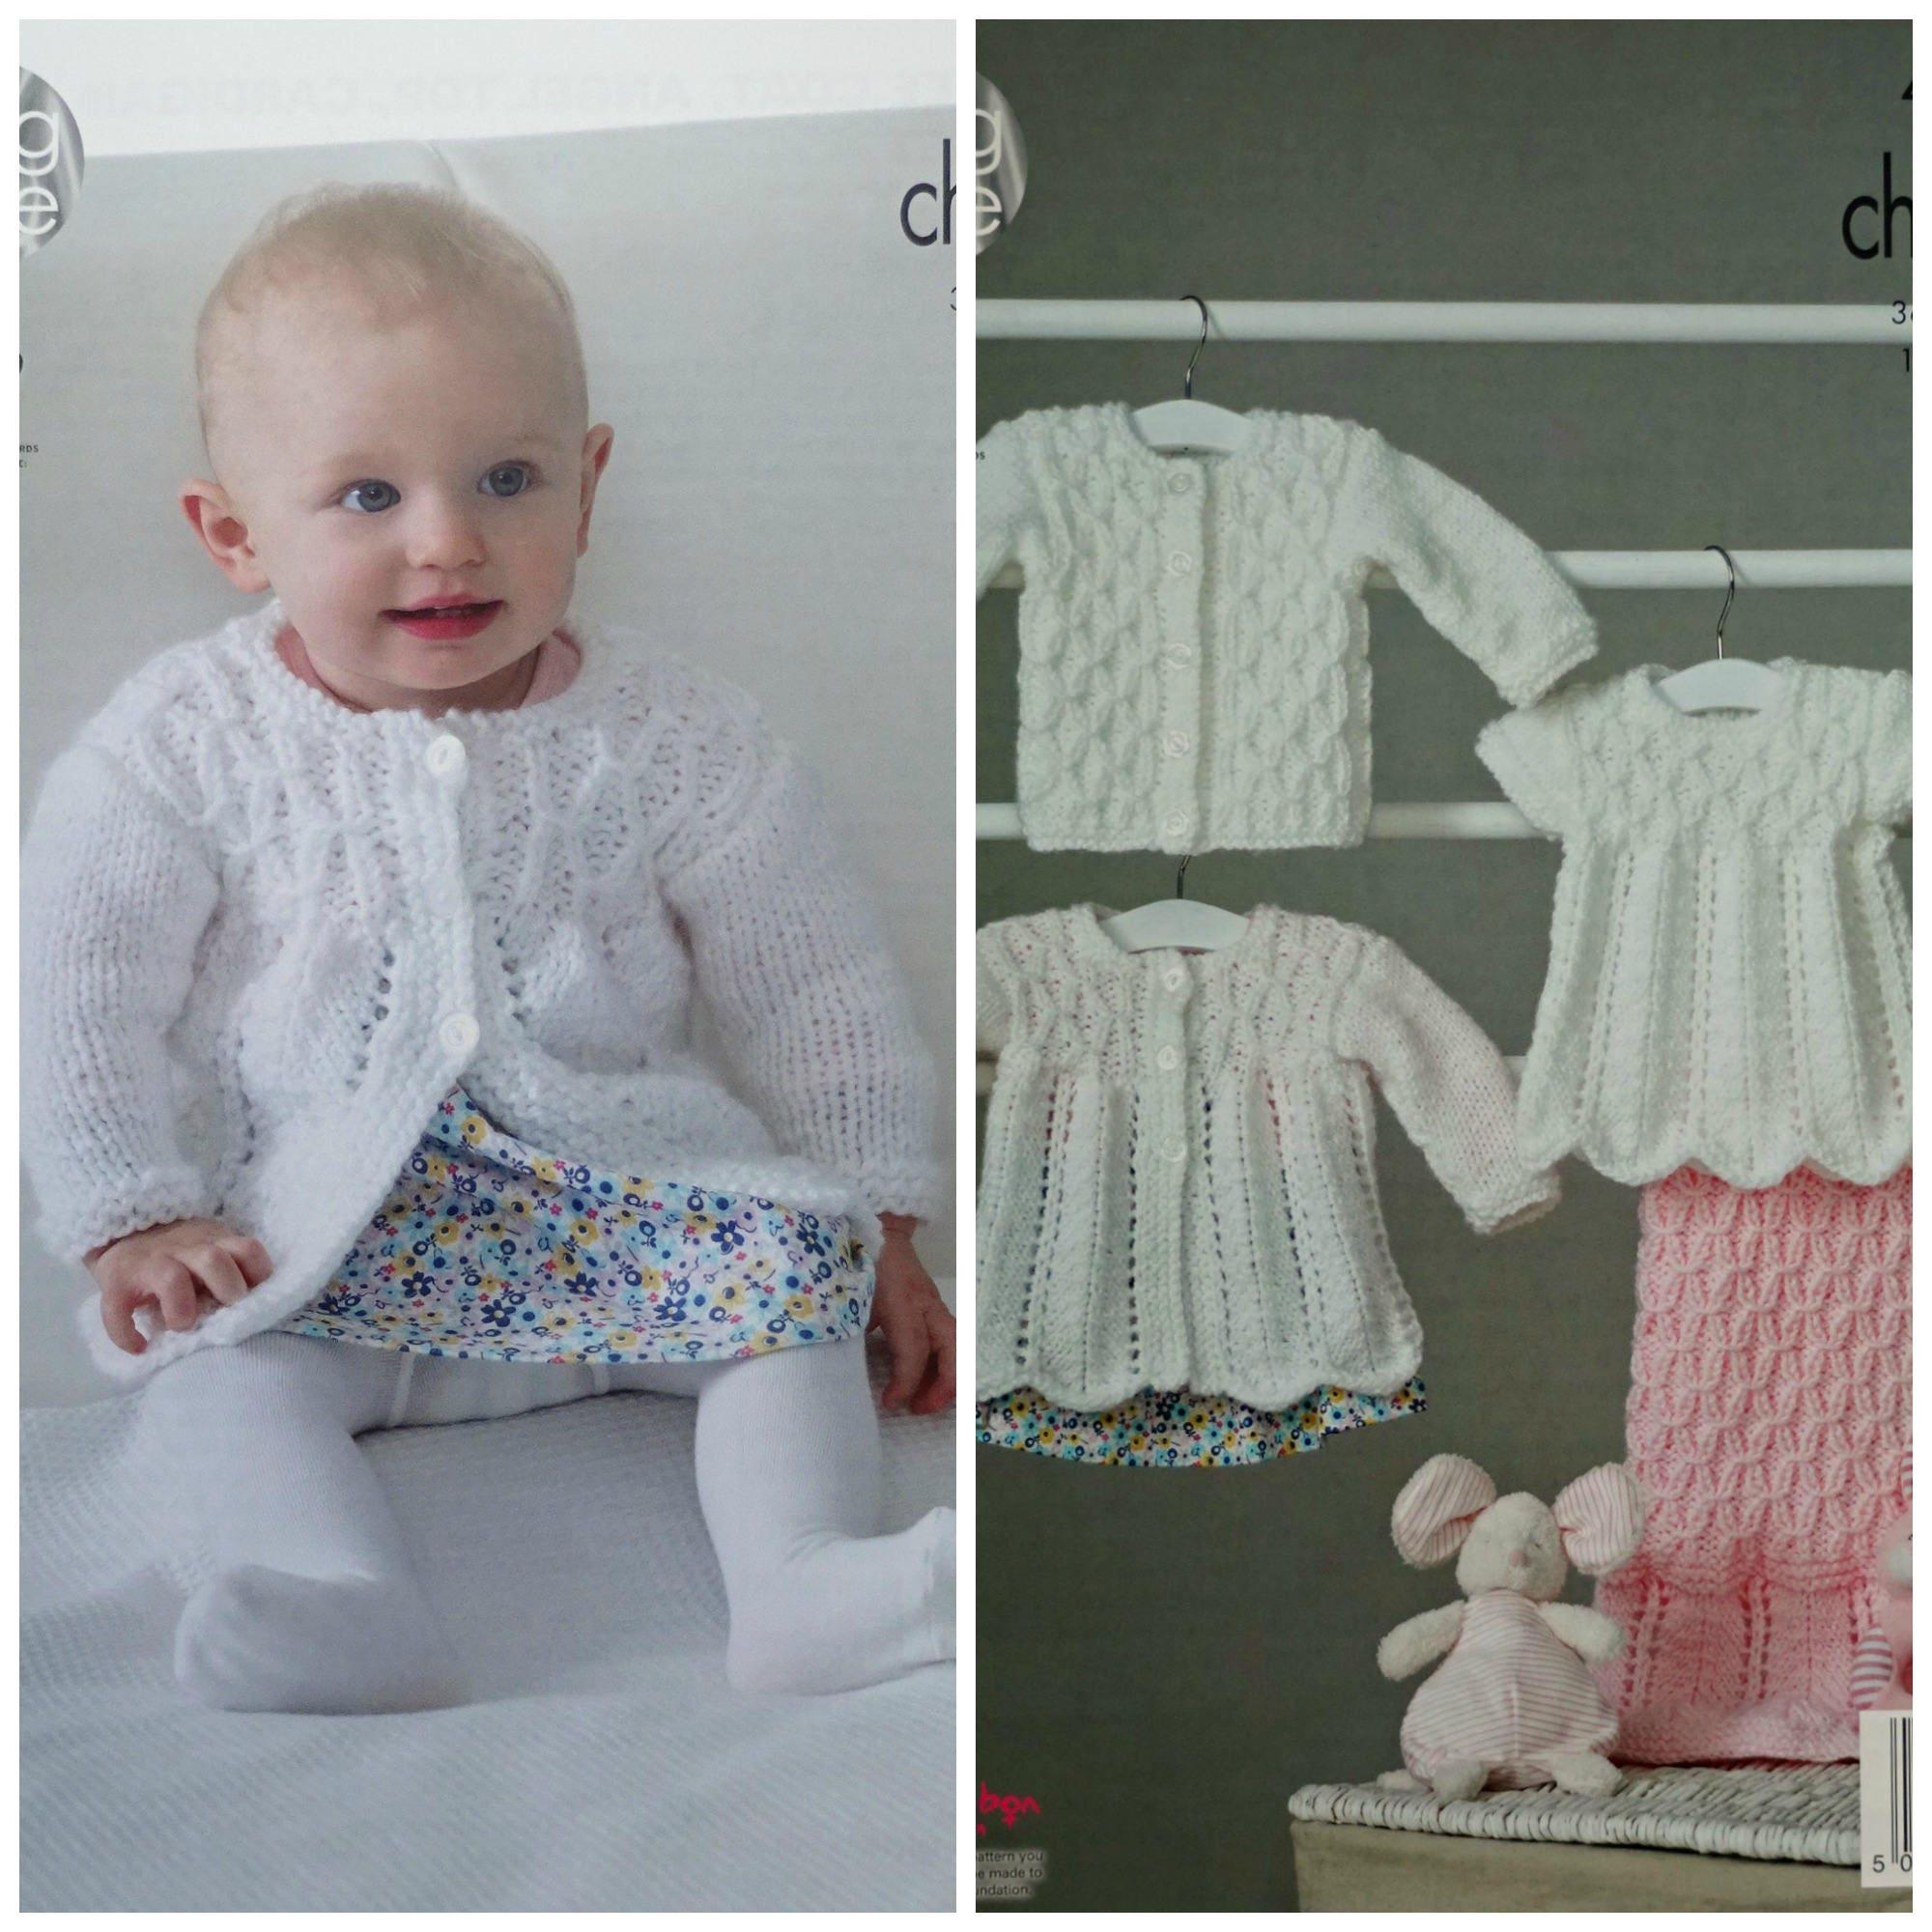 fa36d89b1 Baby Knitting Pattern K4848 Babies Cardigan Blanket Matinee Coat ...